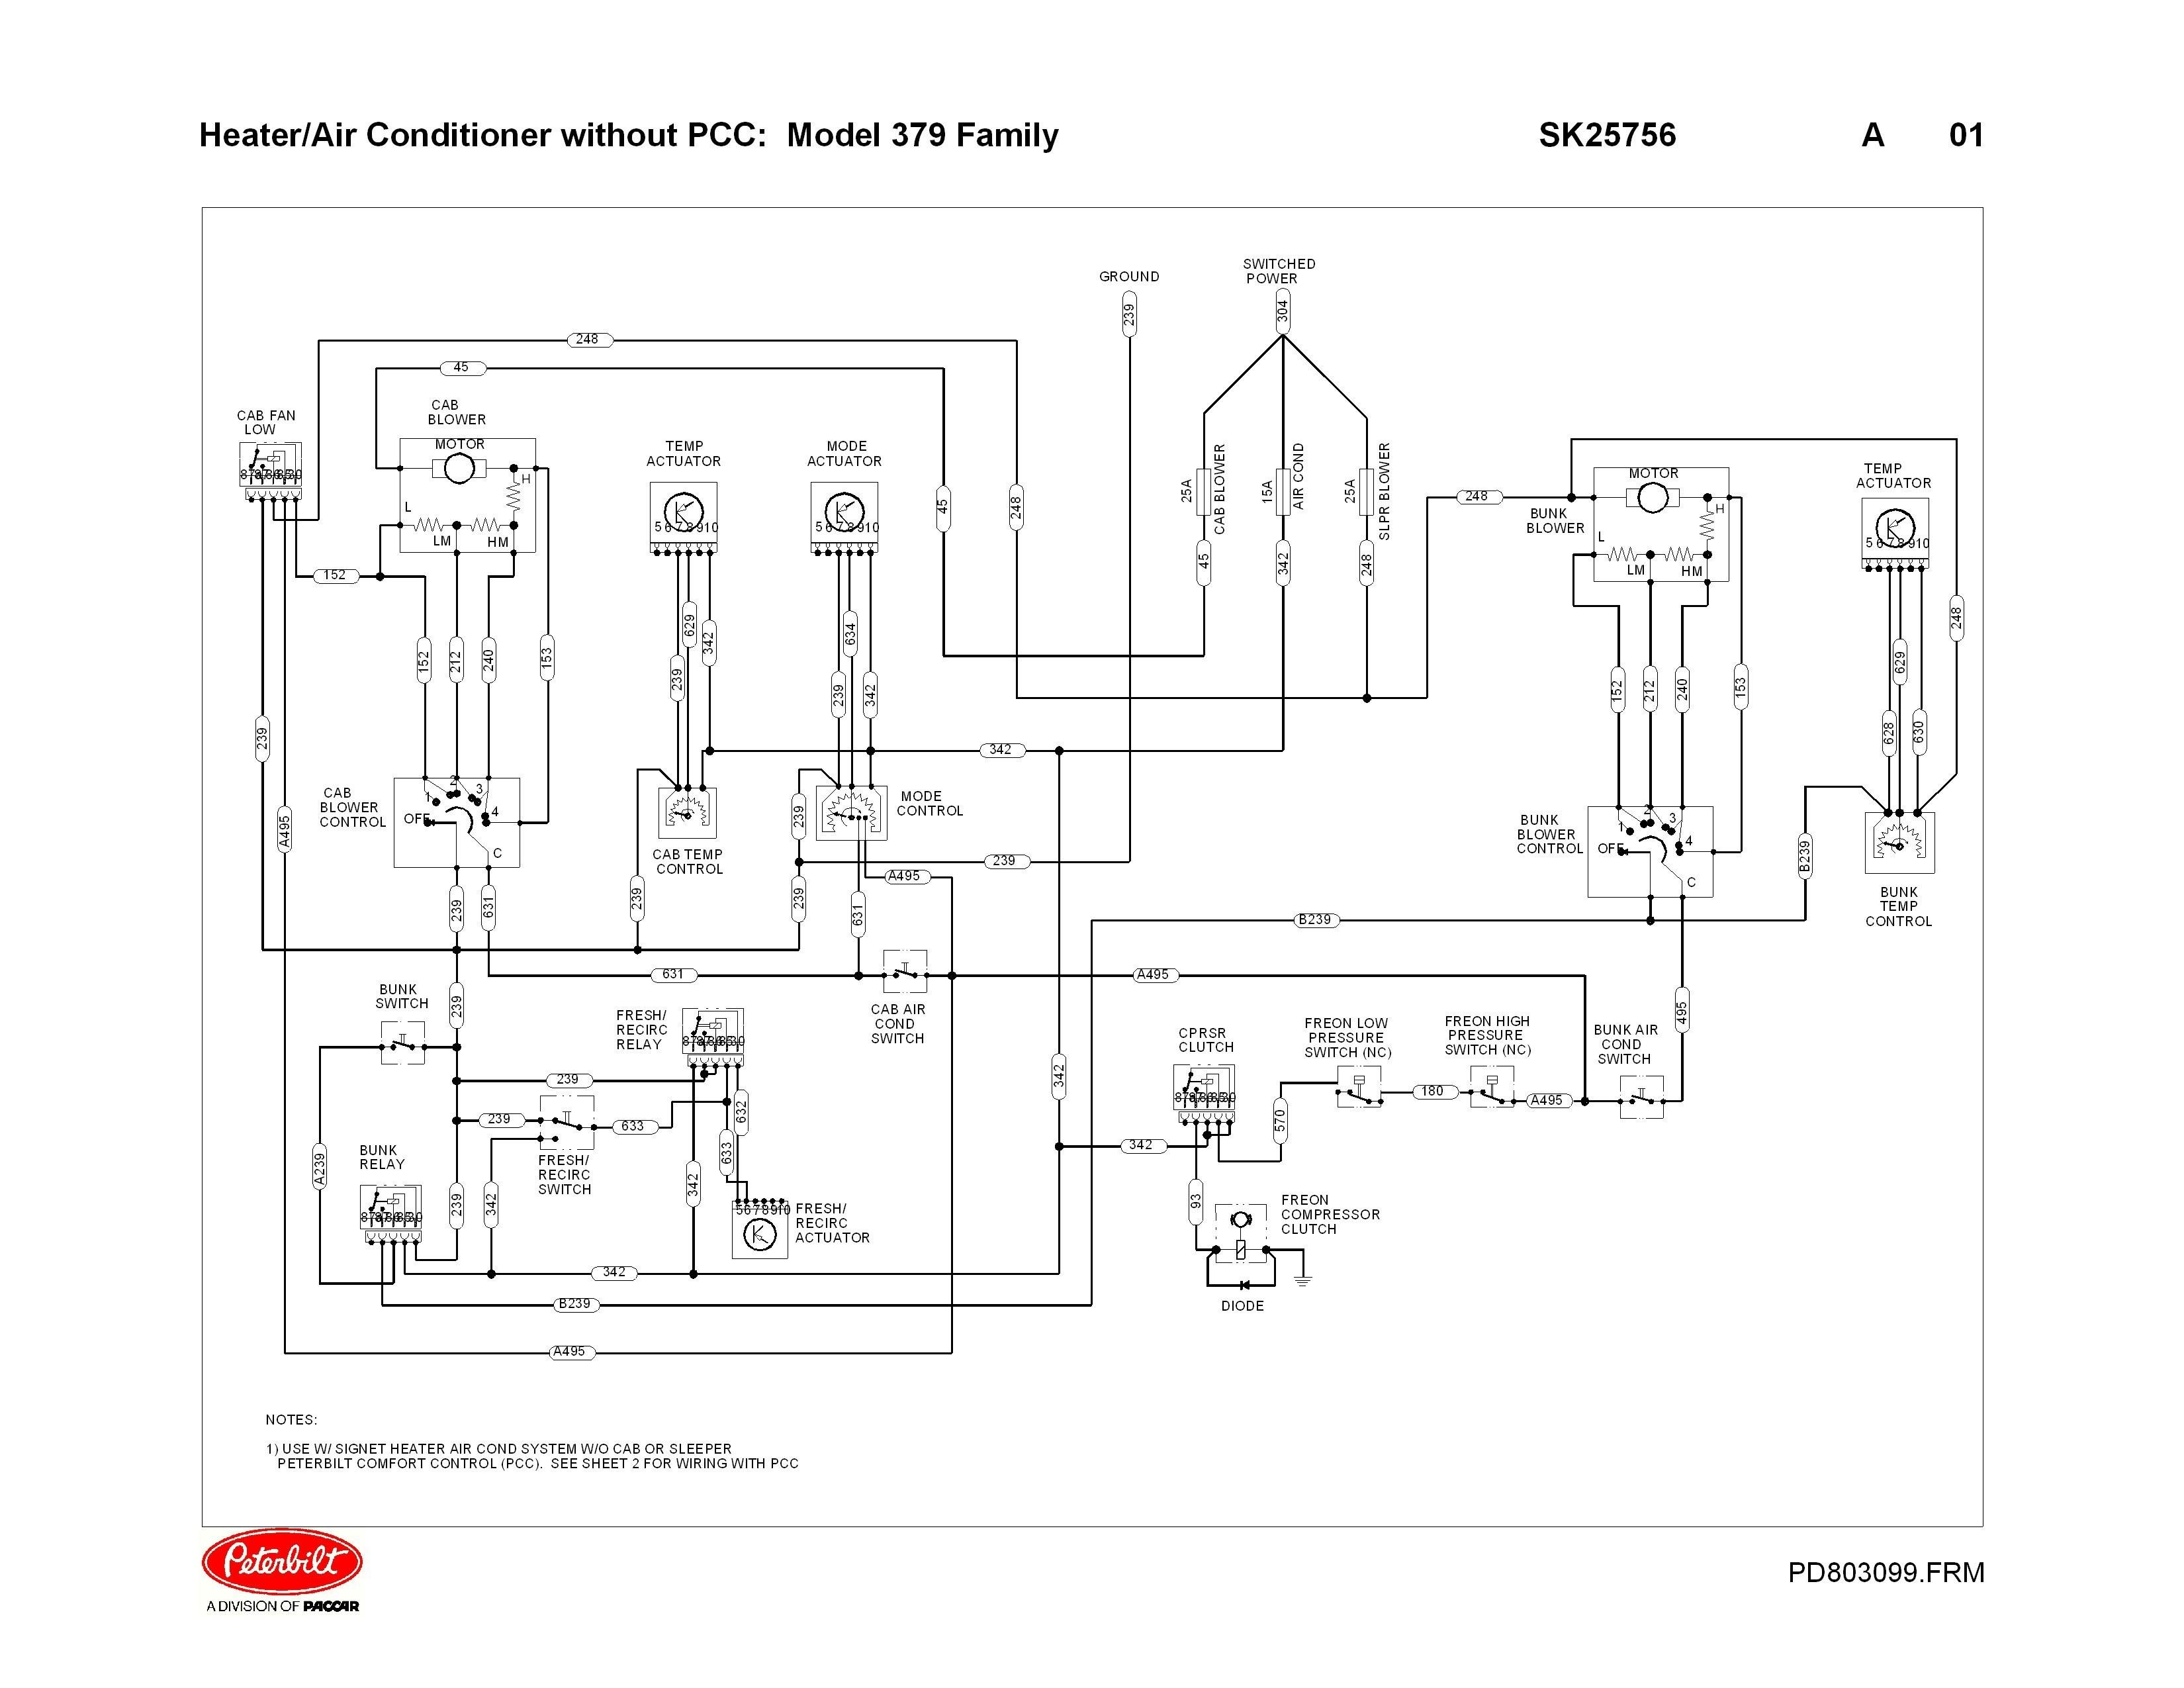 1986 peterbilt 359 wiring diagram